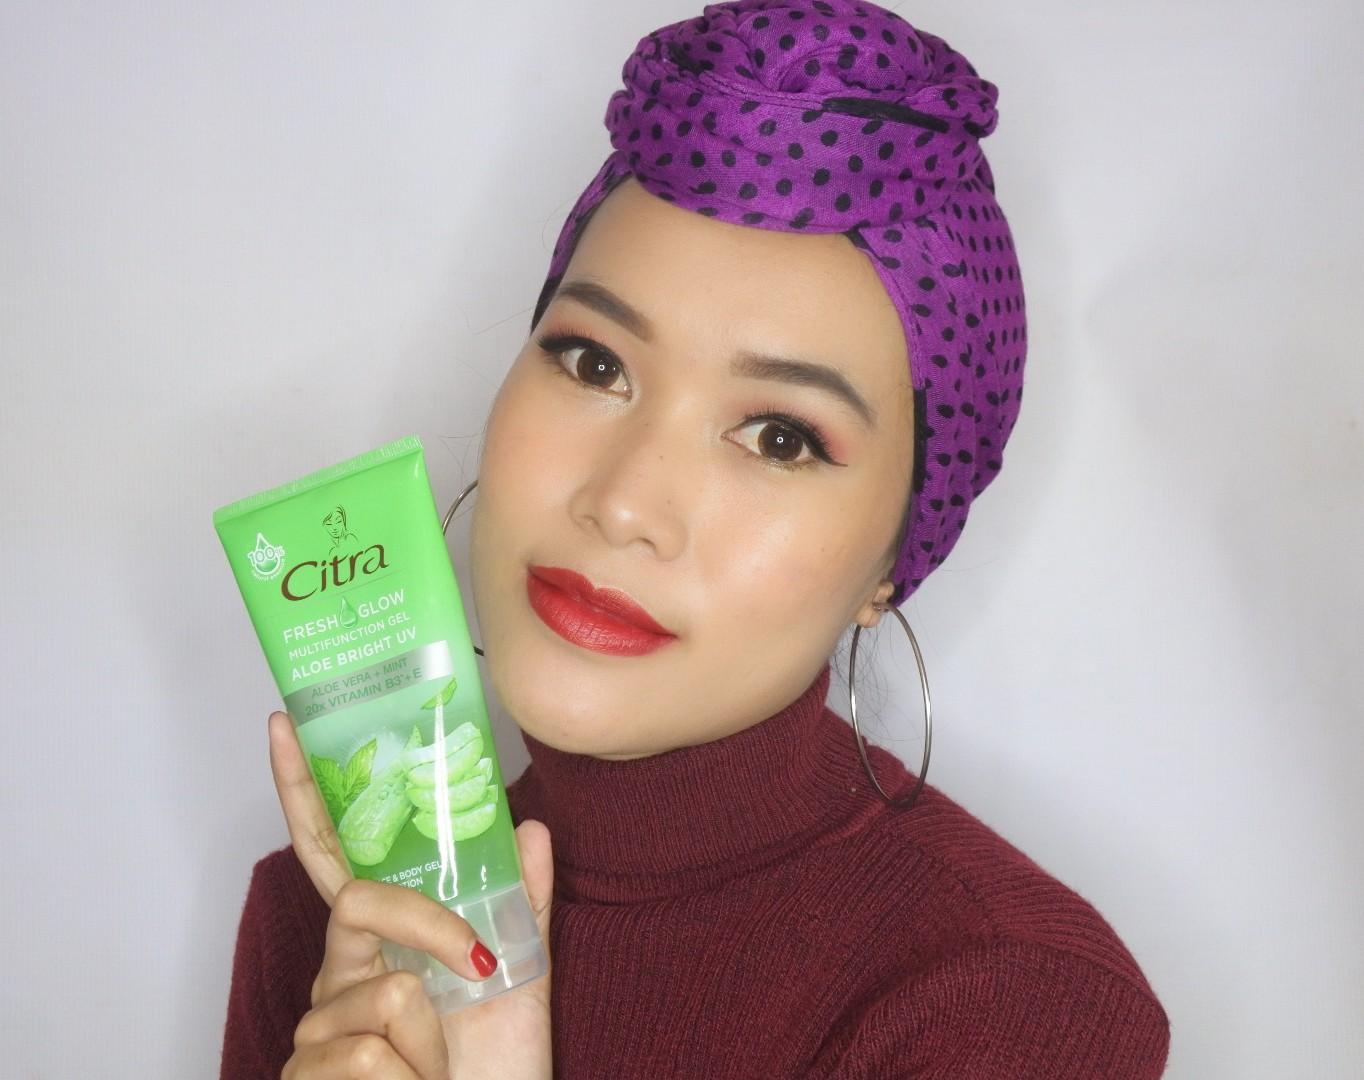 Citra Fresh Glow Multifunction Gel Aloe Bright Uv Daretochange By Indonesian Beauty Blogger